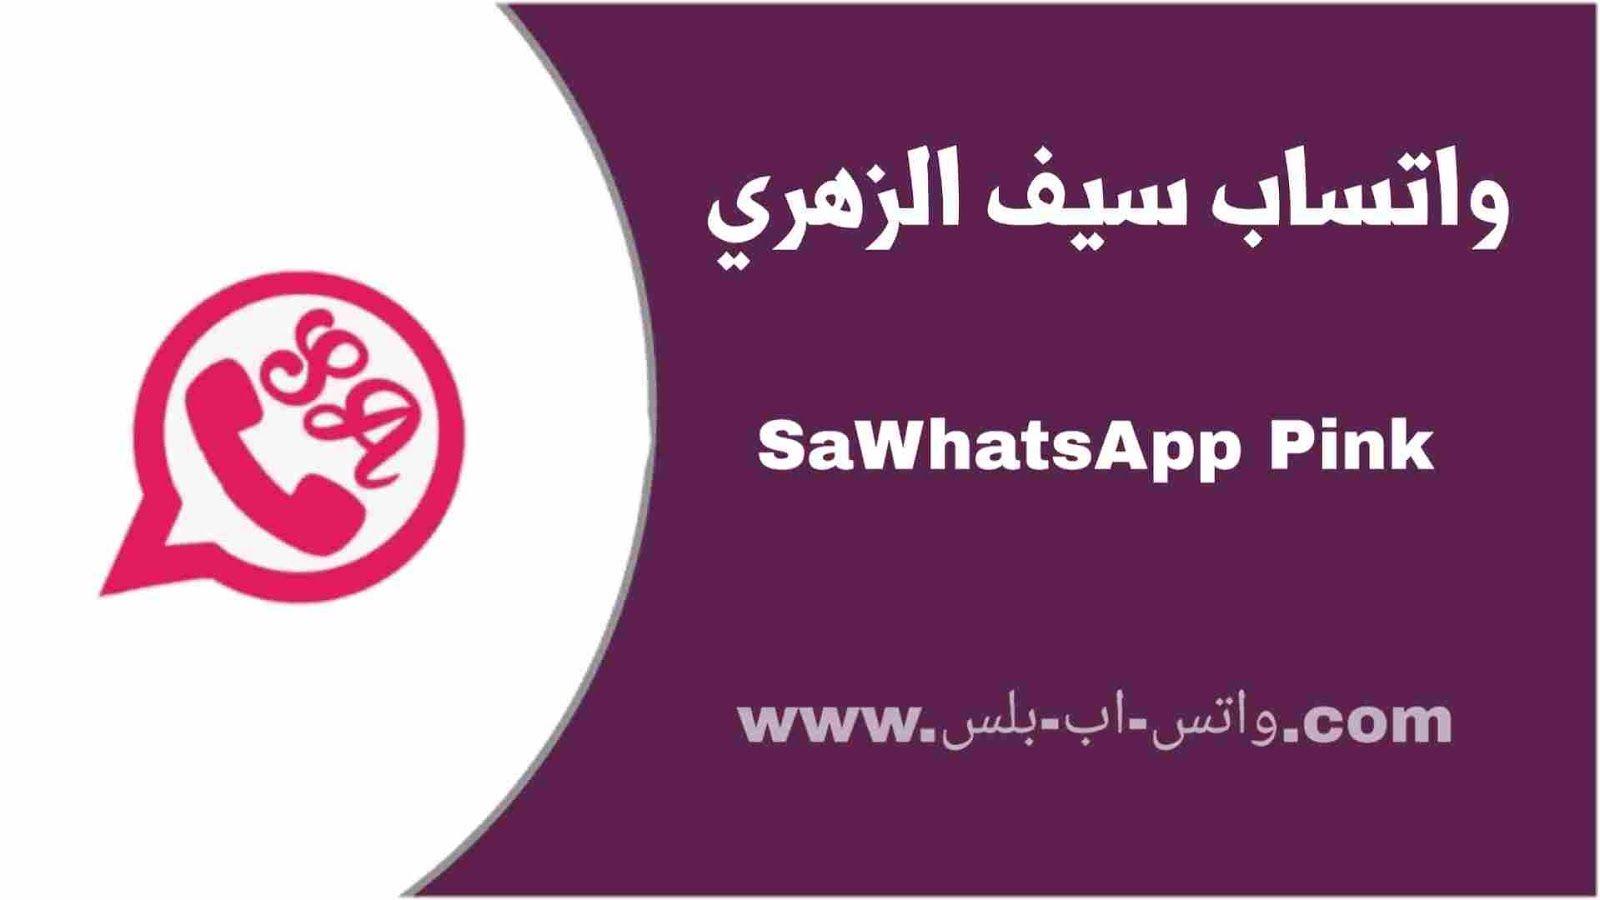 تحميل تطبيق Whatsapp Plus واتساب بلس ابو صدام الرفاعي V6 25 اخر اصدار Play Store App Android Apps App